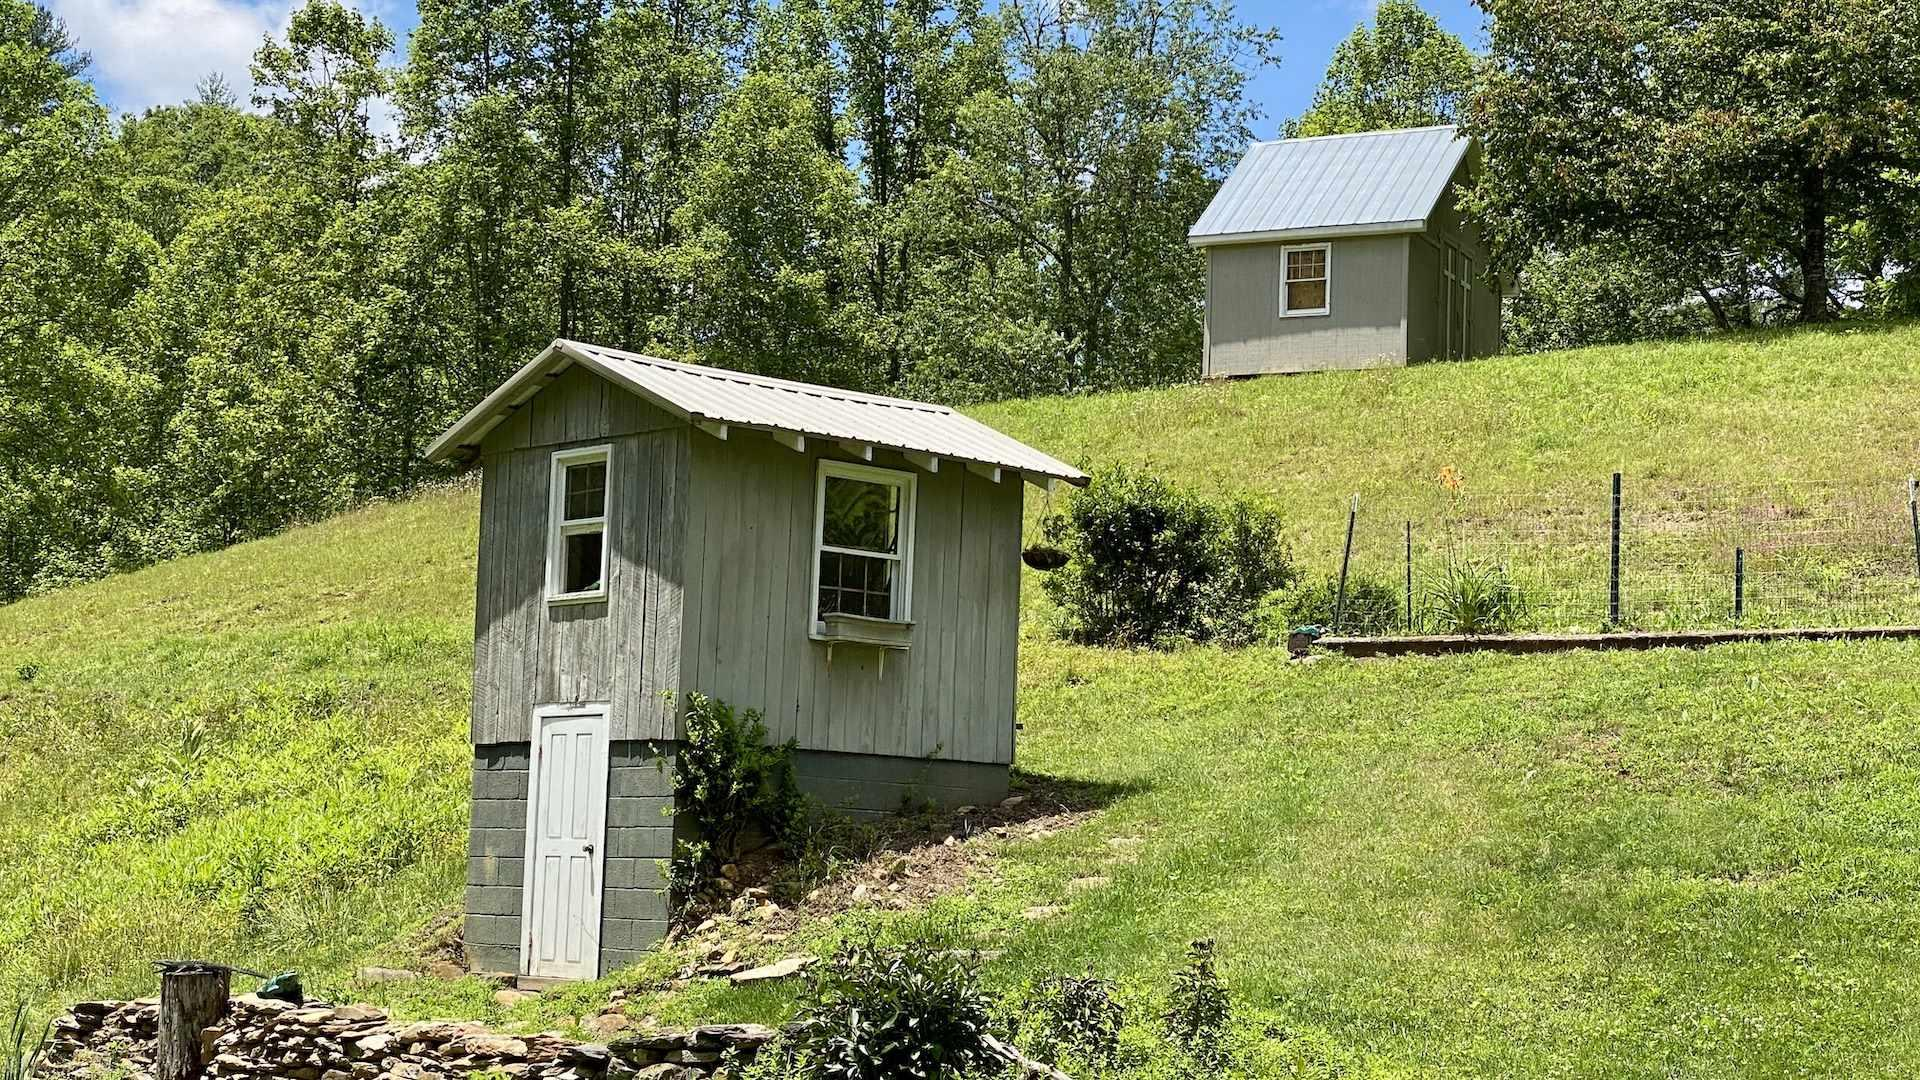 584 Old Wildcat, Hillsville, VA, 24343